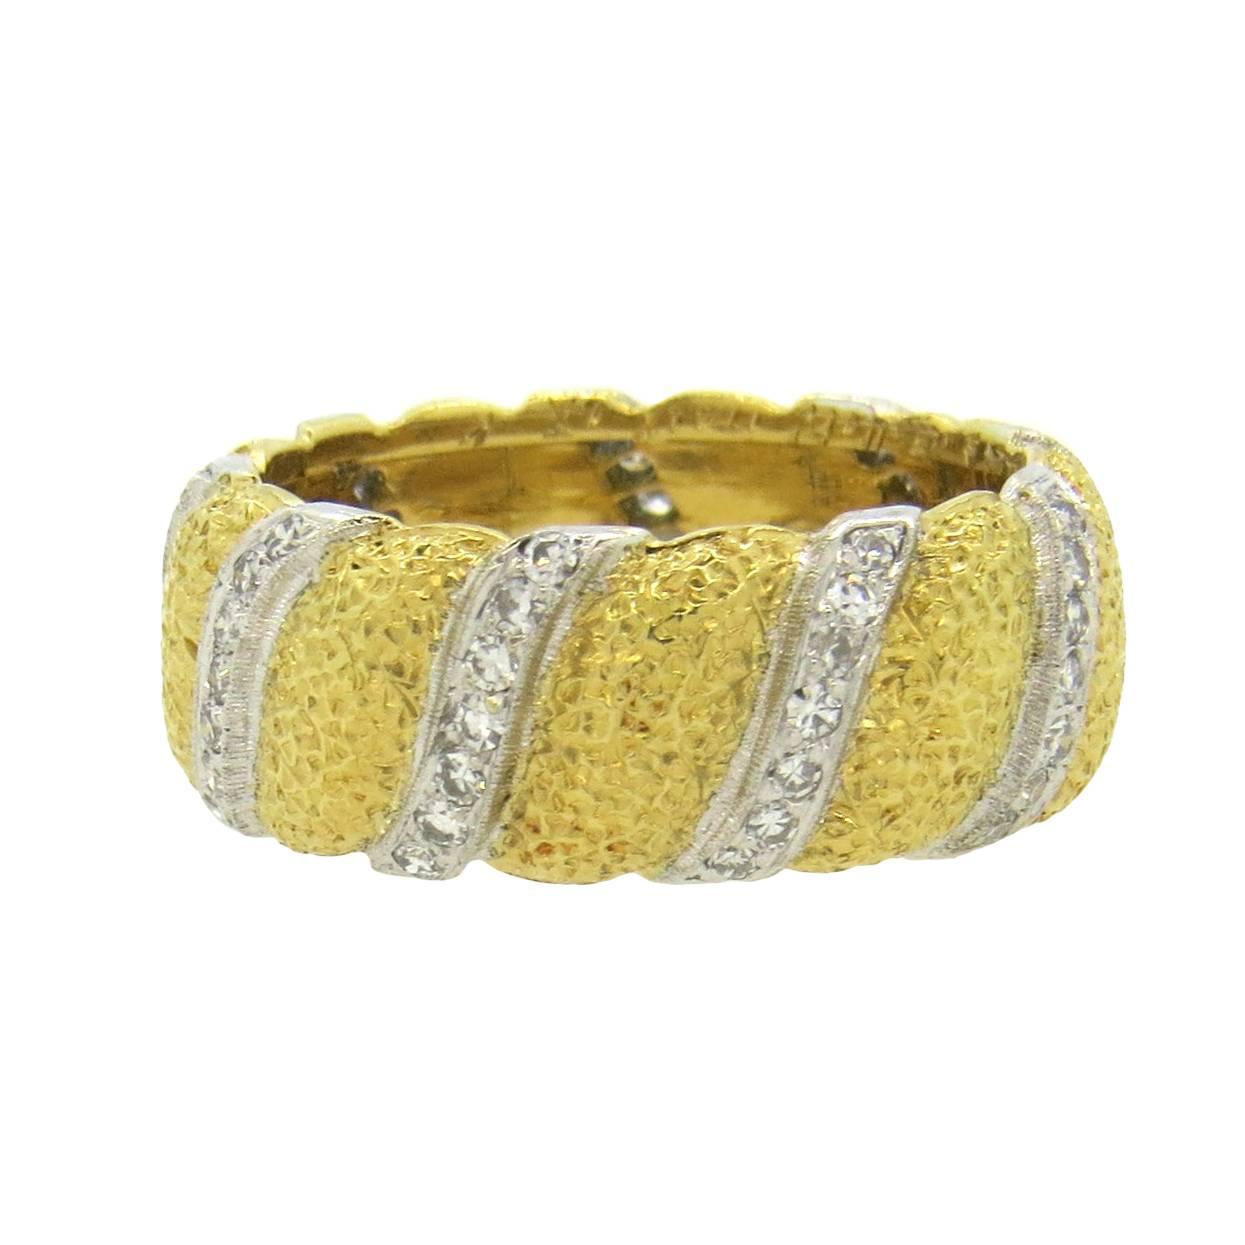 Buccellati Diamond Gold Wedding Band Ring